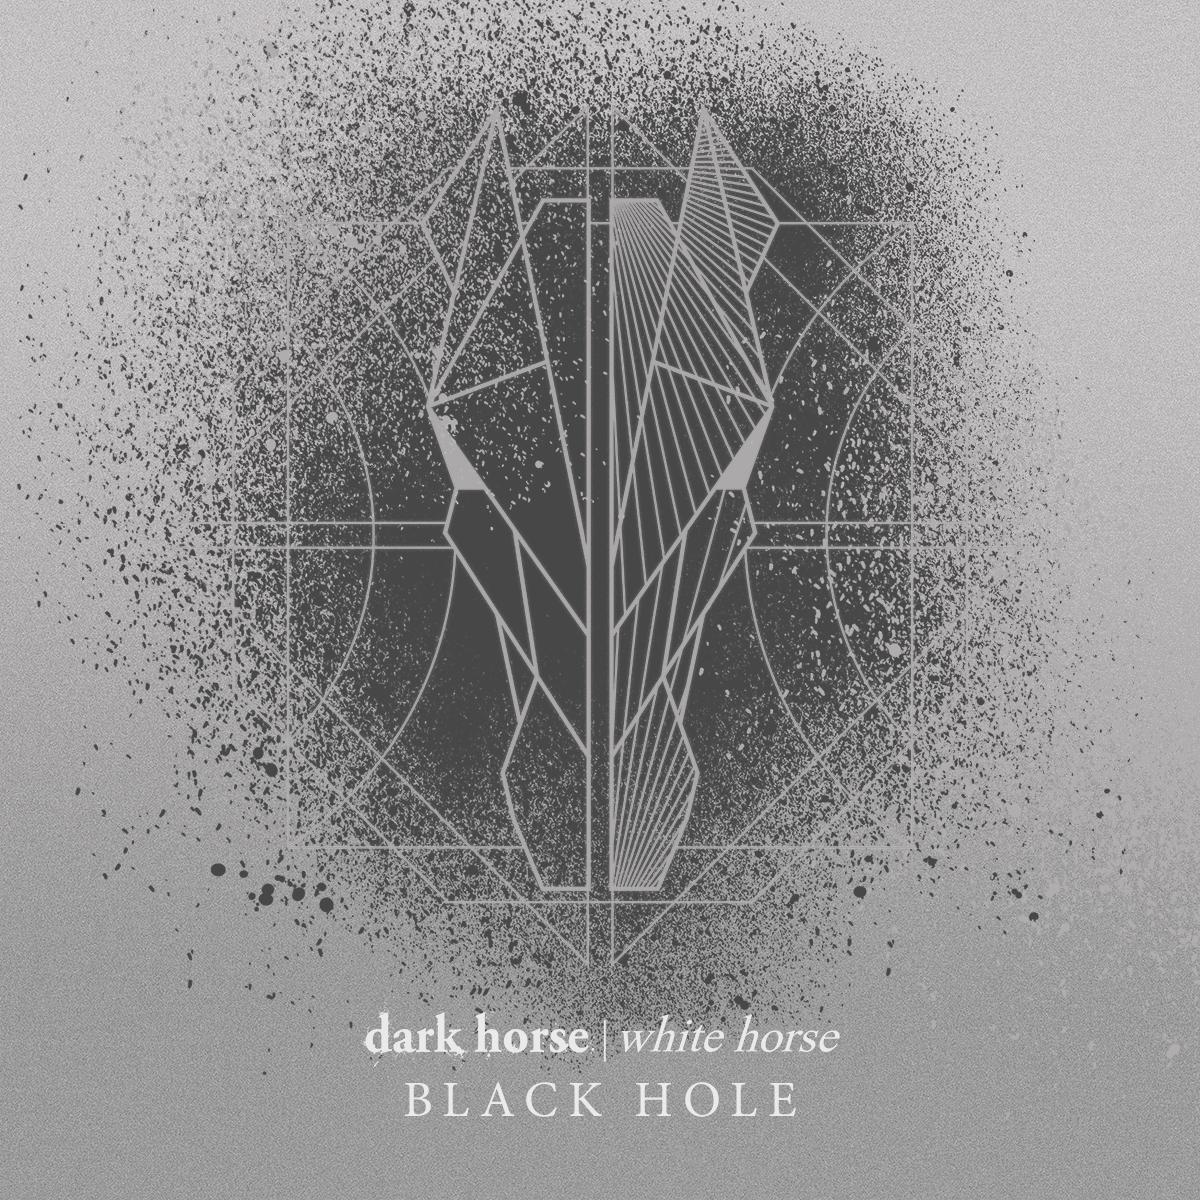 DARK HORSE WHITE HORSE - Black Hole